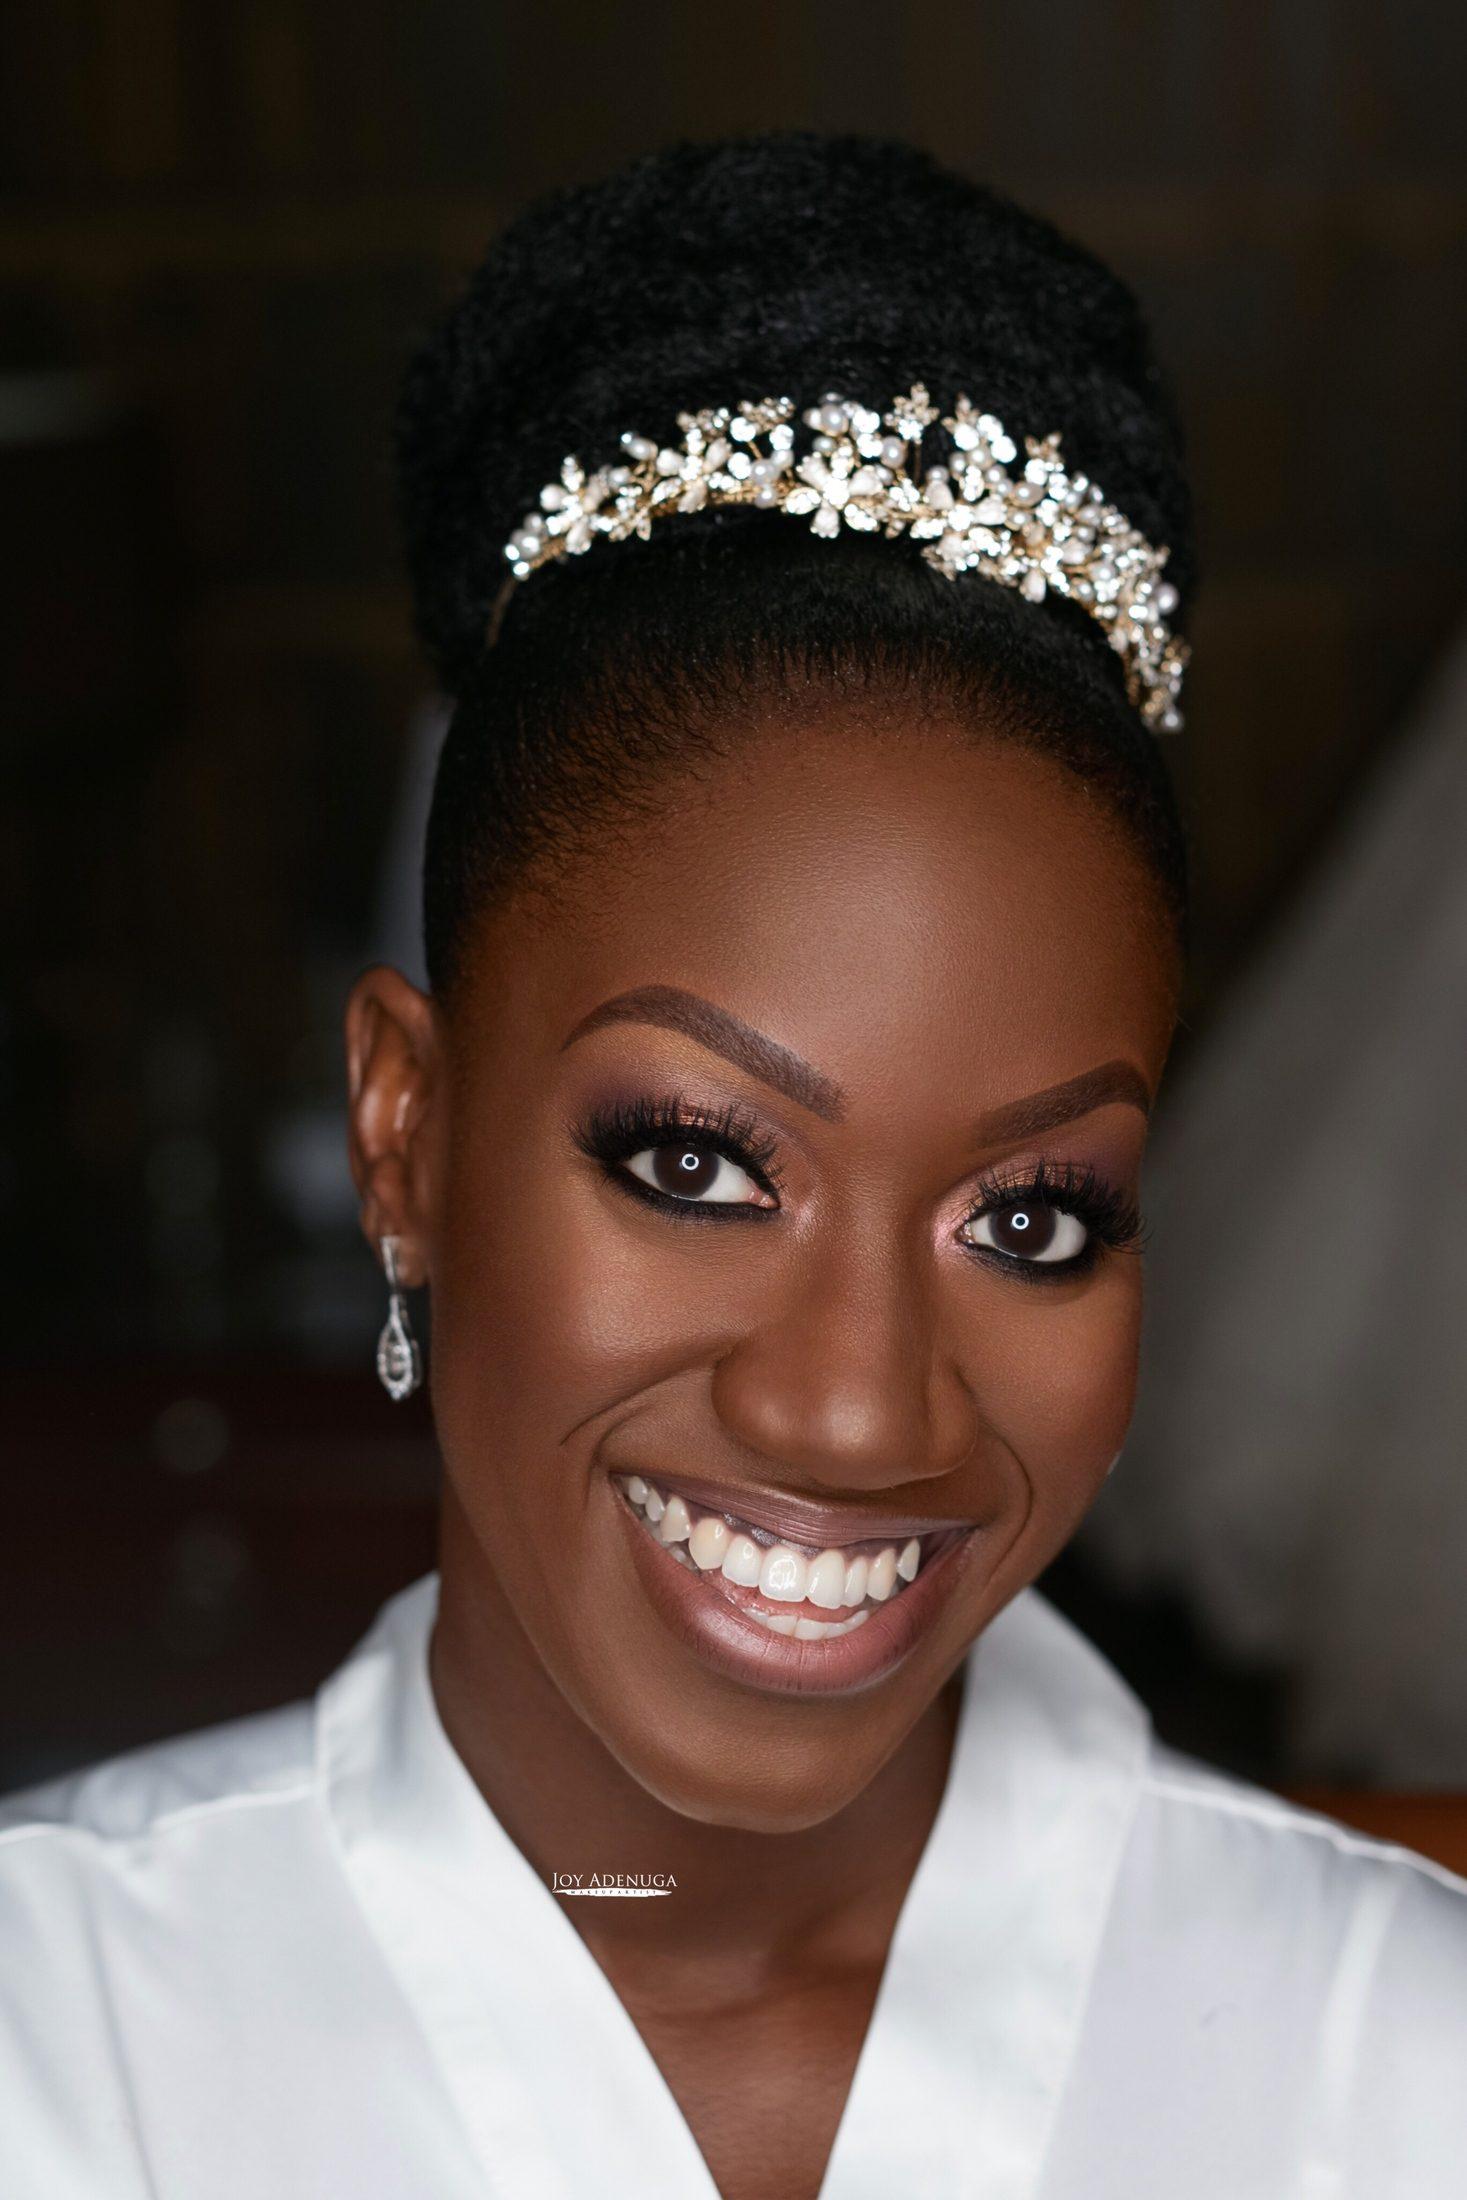 Shanie's Wedding, Joy Adenuga, black bride, black bridal blog london, london black makeup artist, london makeup artist for black skin, black bridal makeup artist london, makeup artist for black skin, nigerian makeup artist london, makeup artist for women of colour